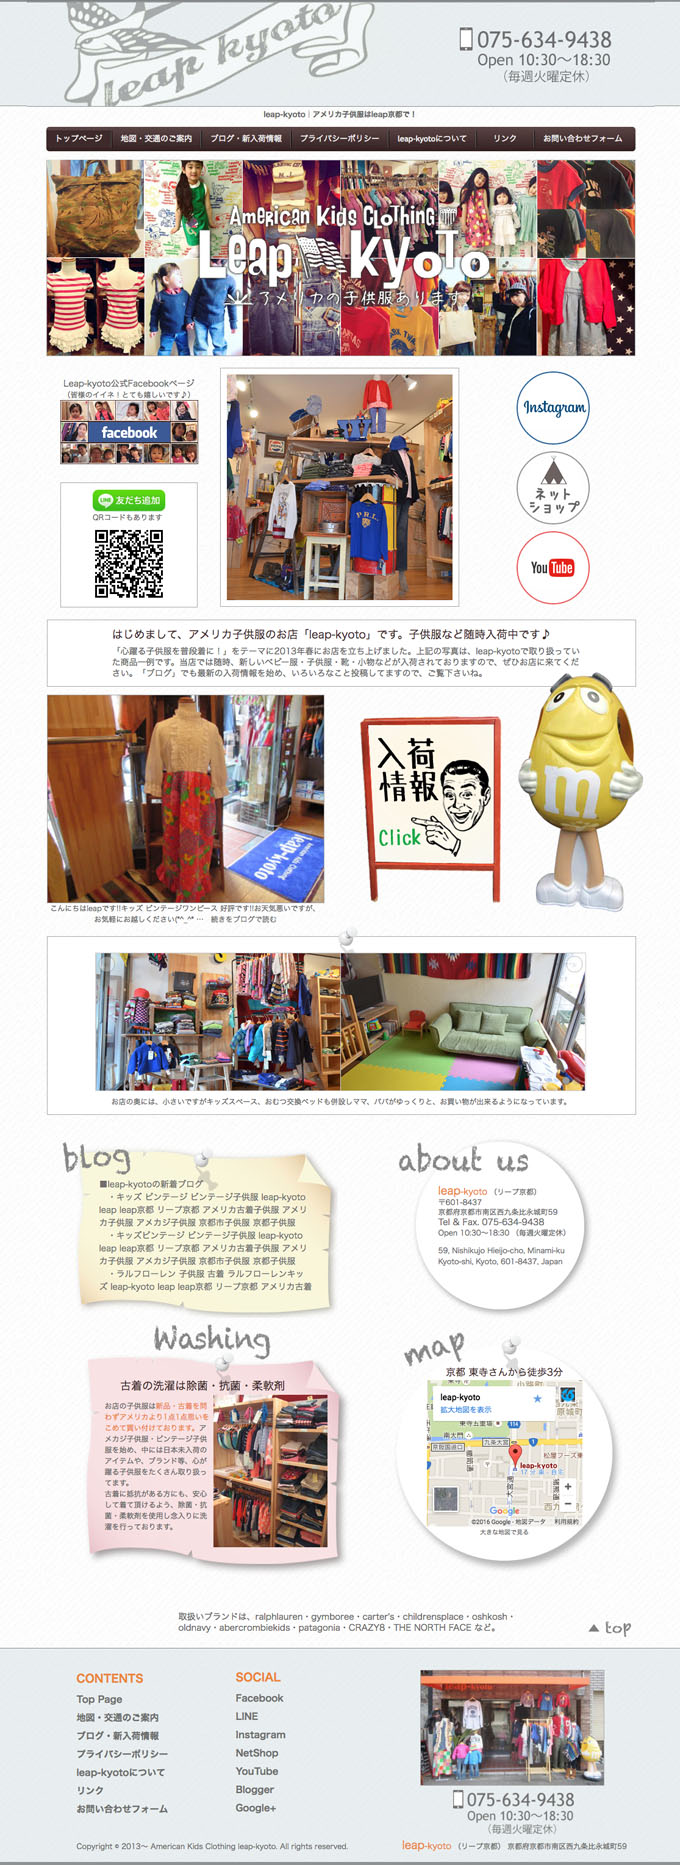 leap-kyoto様のホームページ